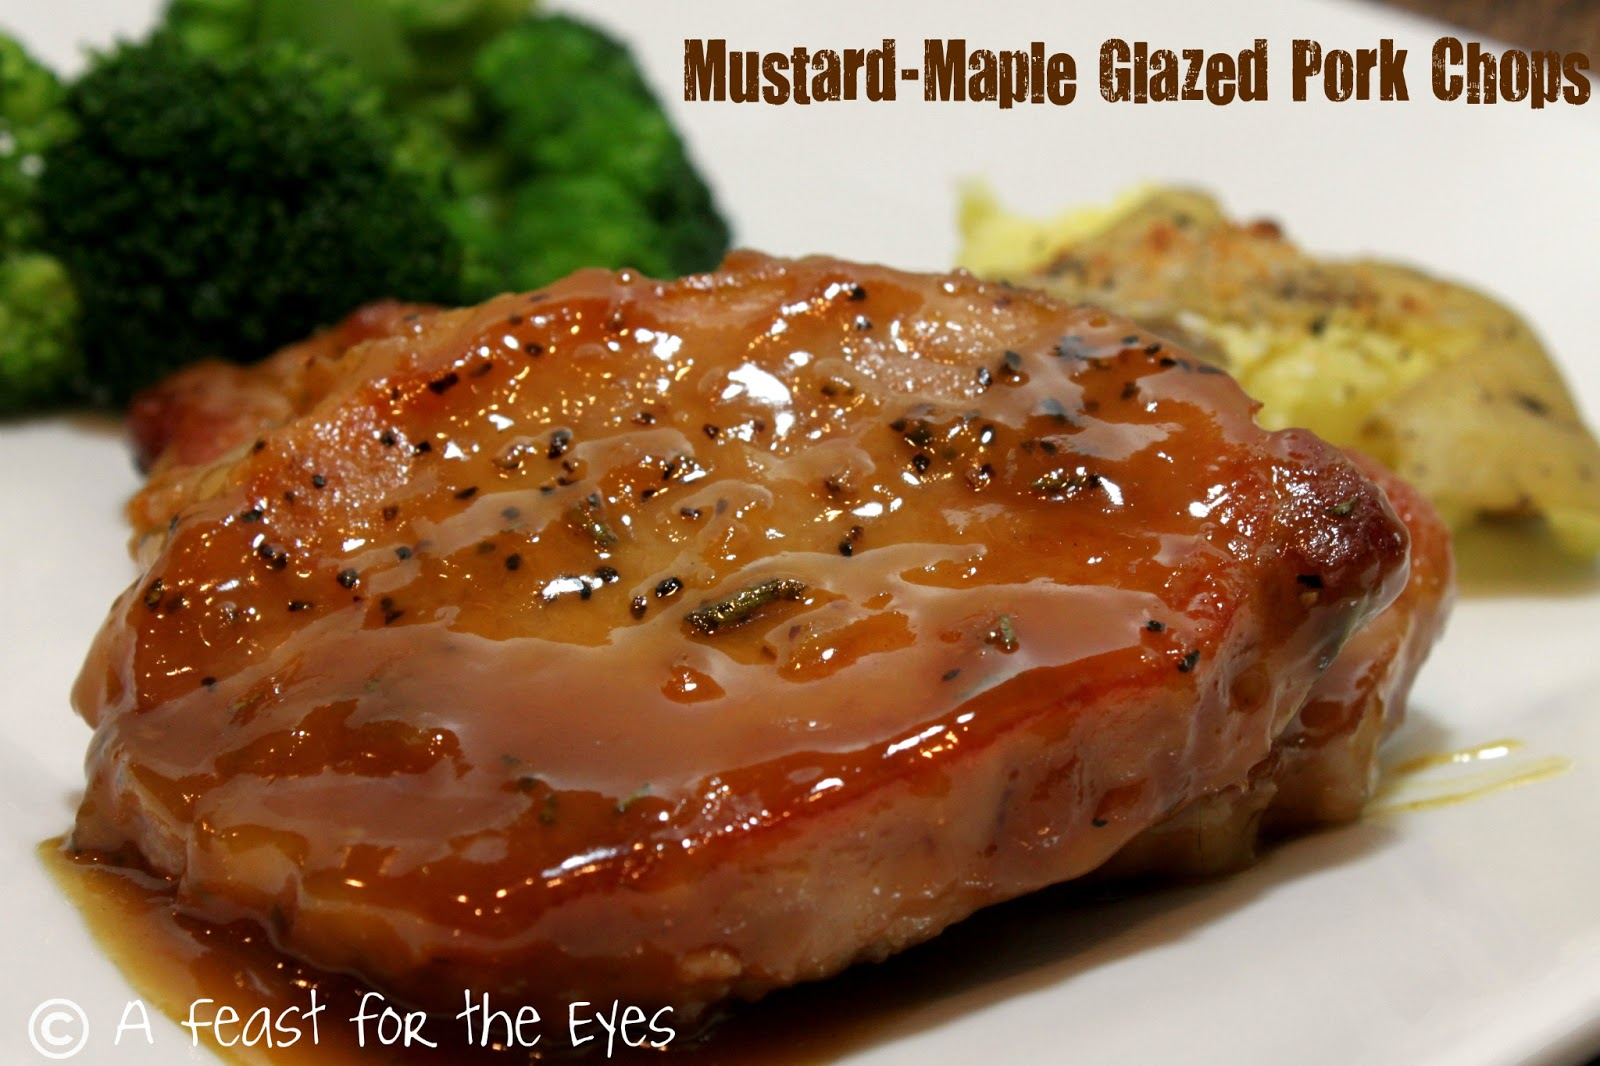 Feast for the Eyes: Mustard-Maple Glazed Pork Chops